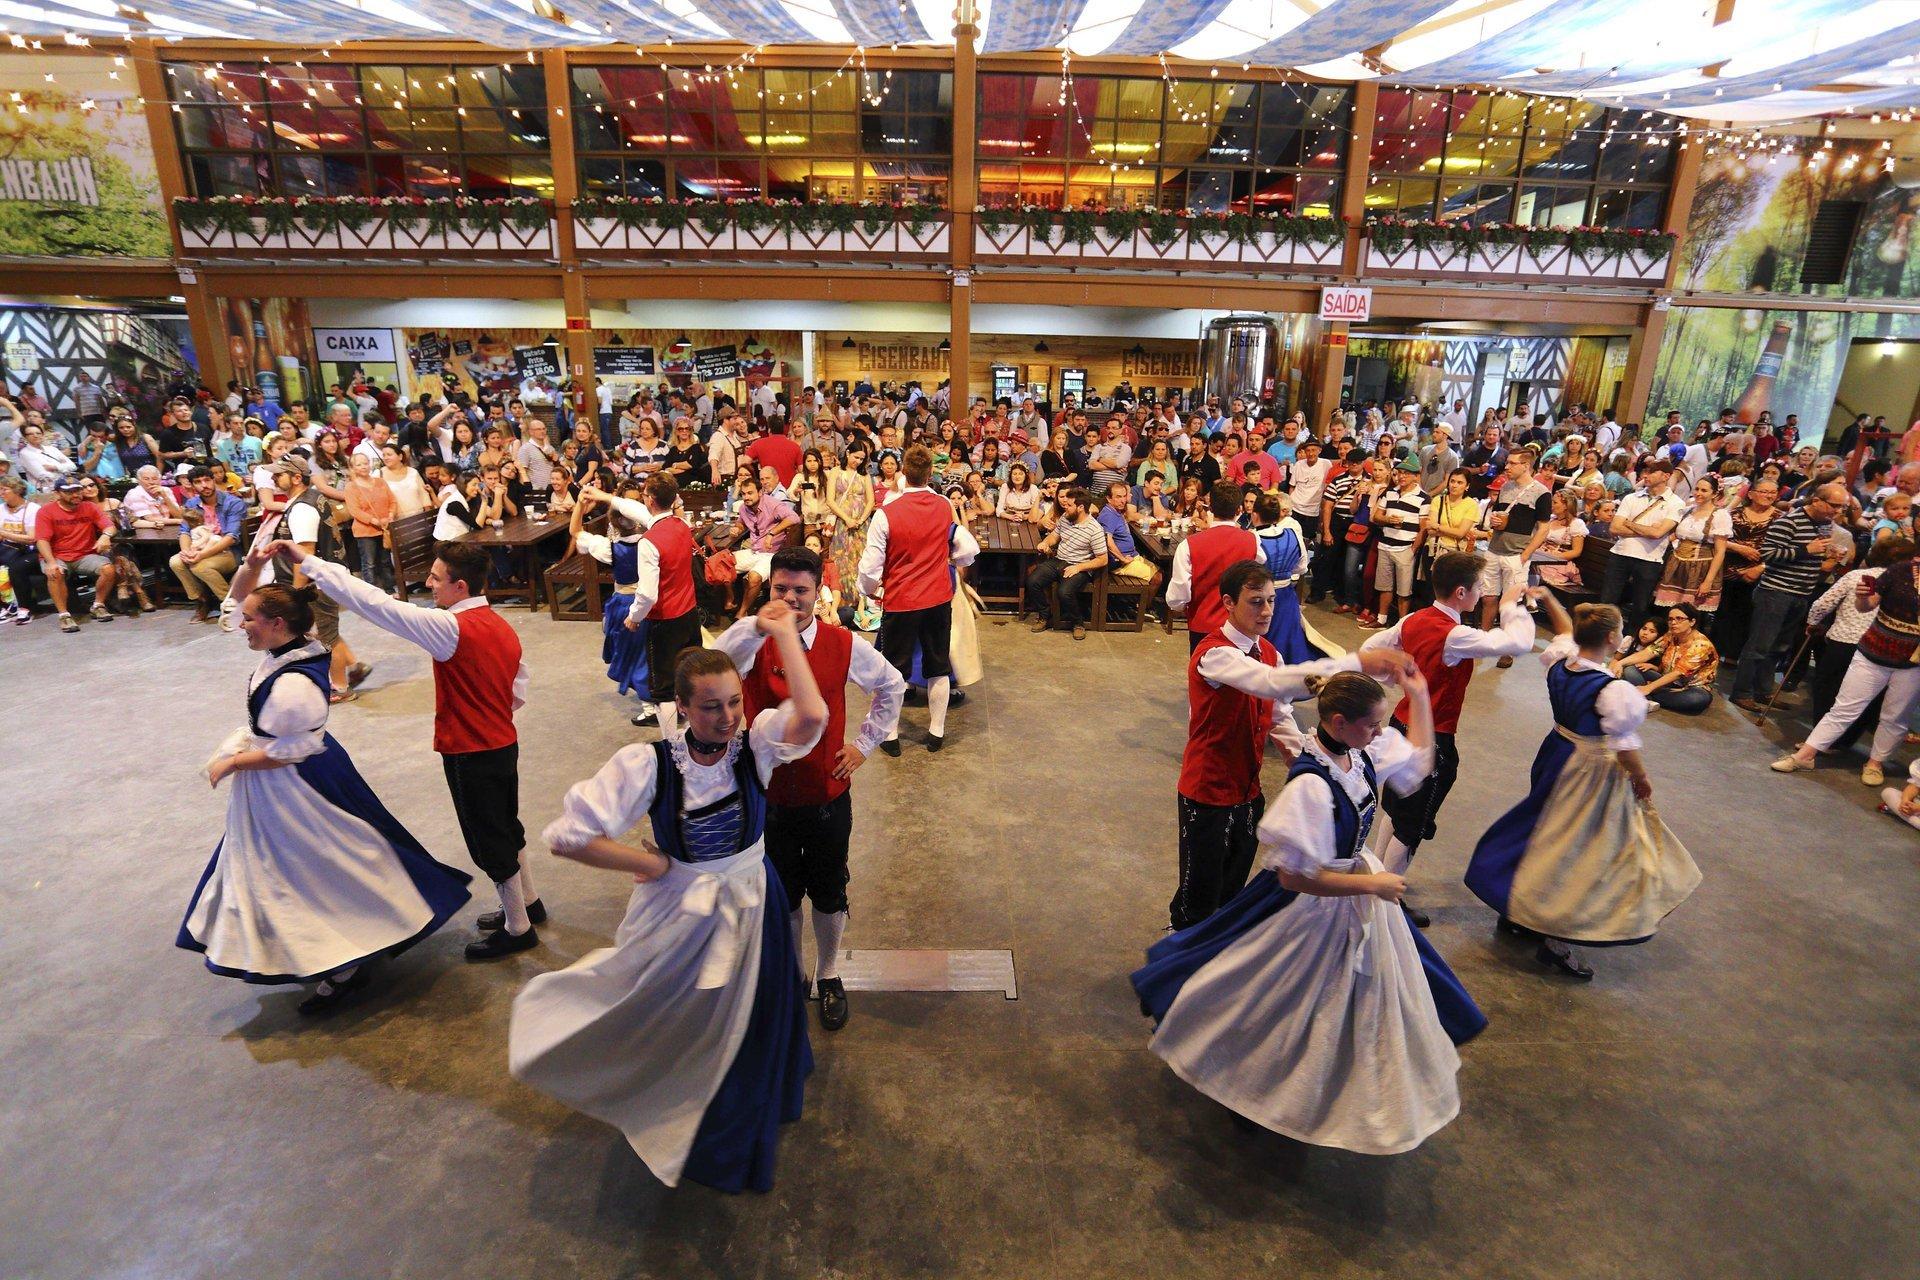 Best time for Oktoberfest Blumenau in Brazil 2020